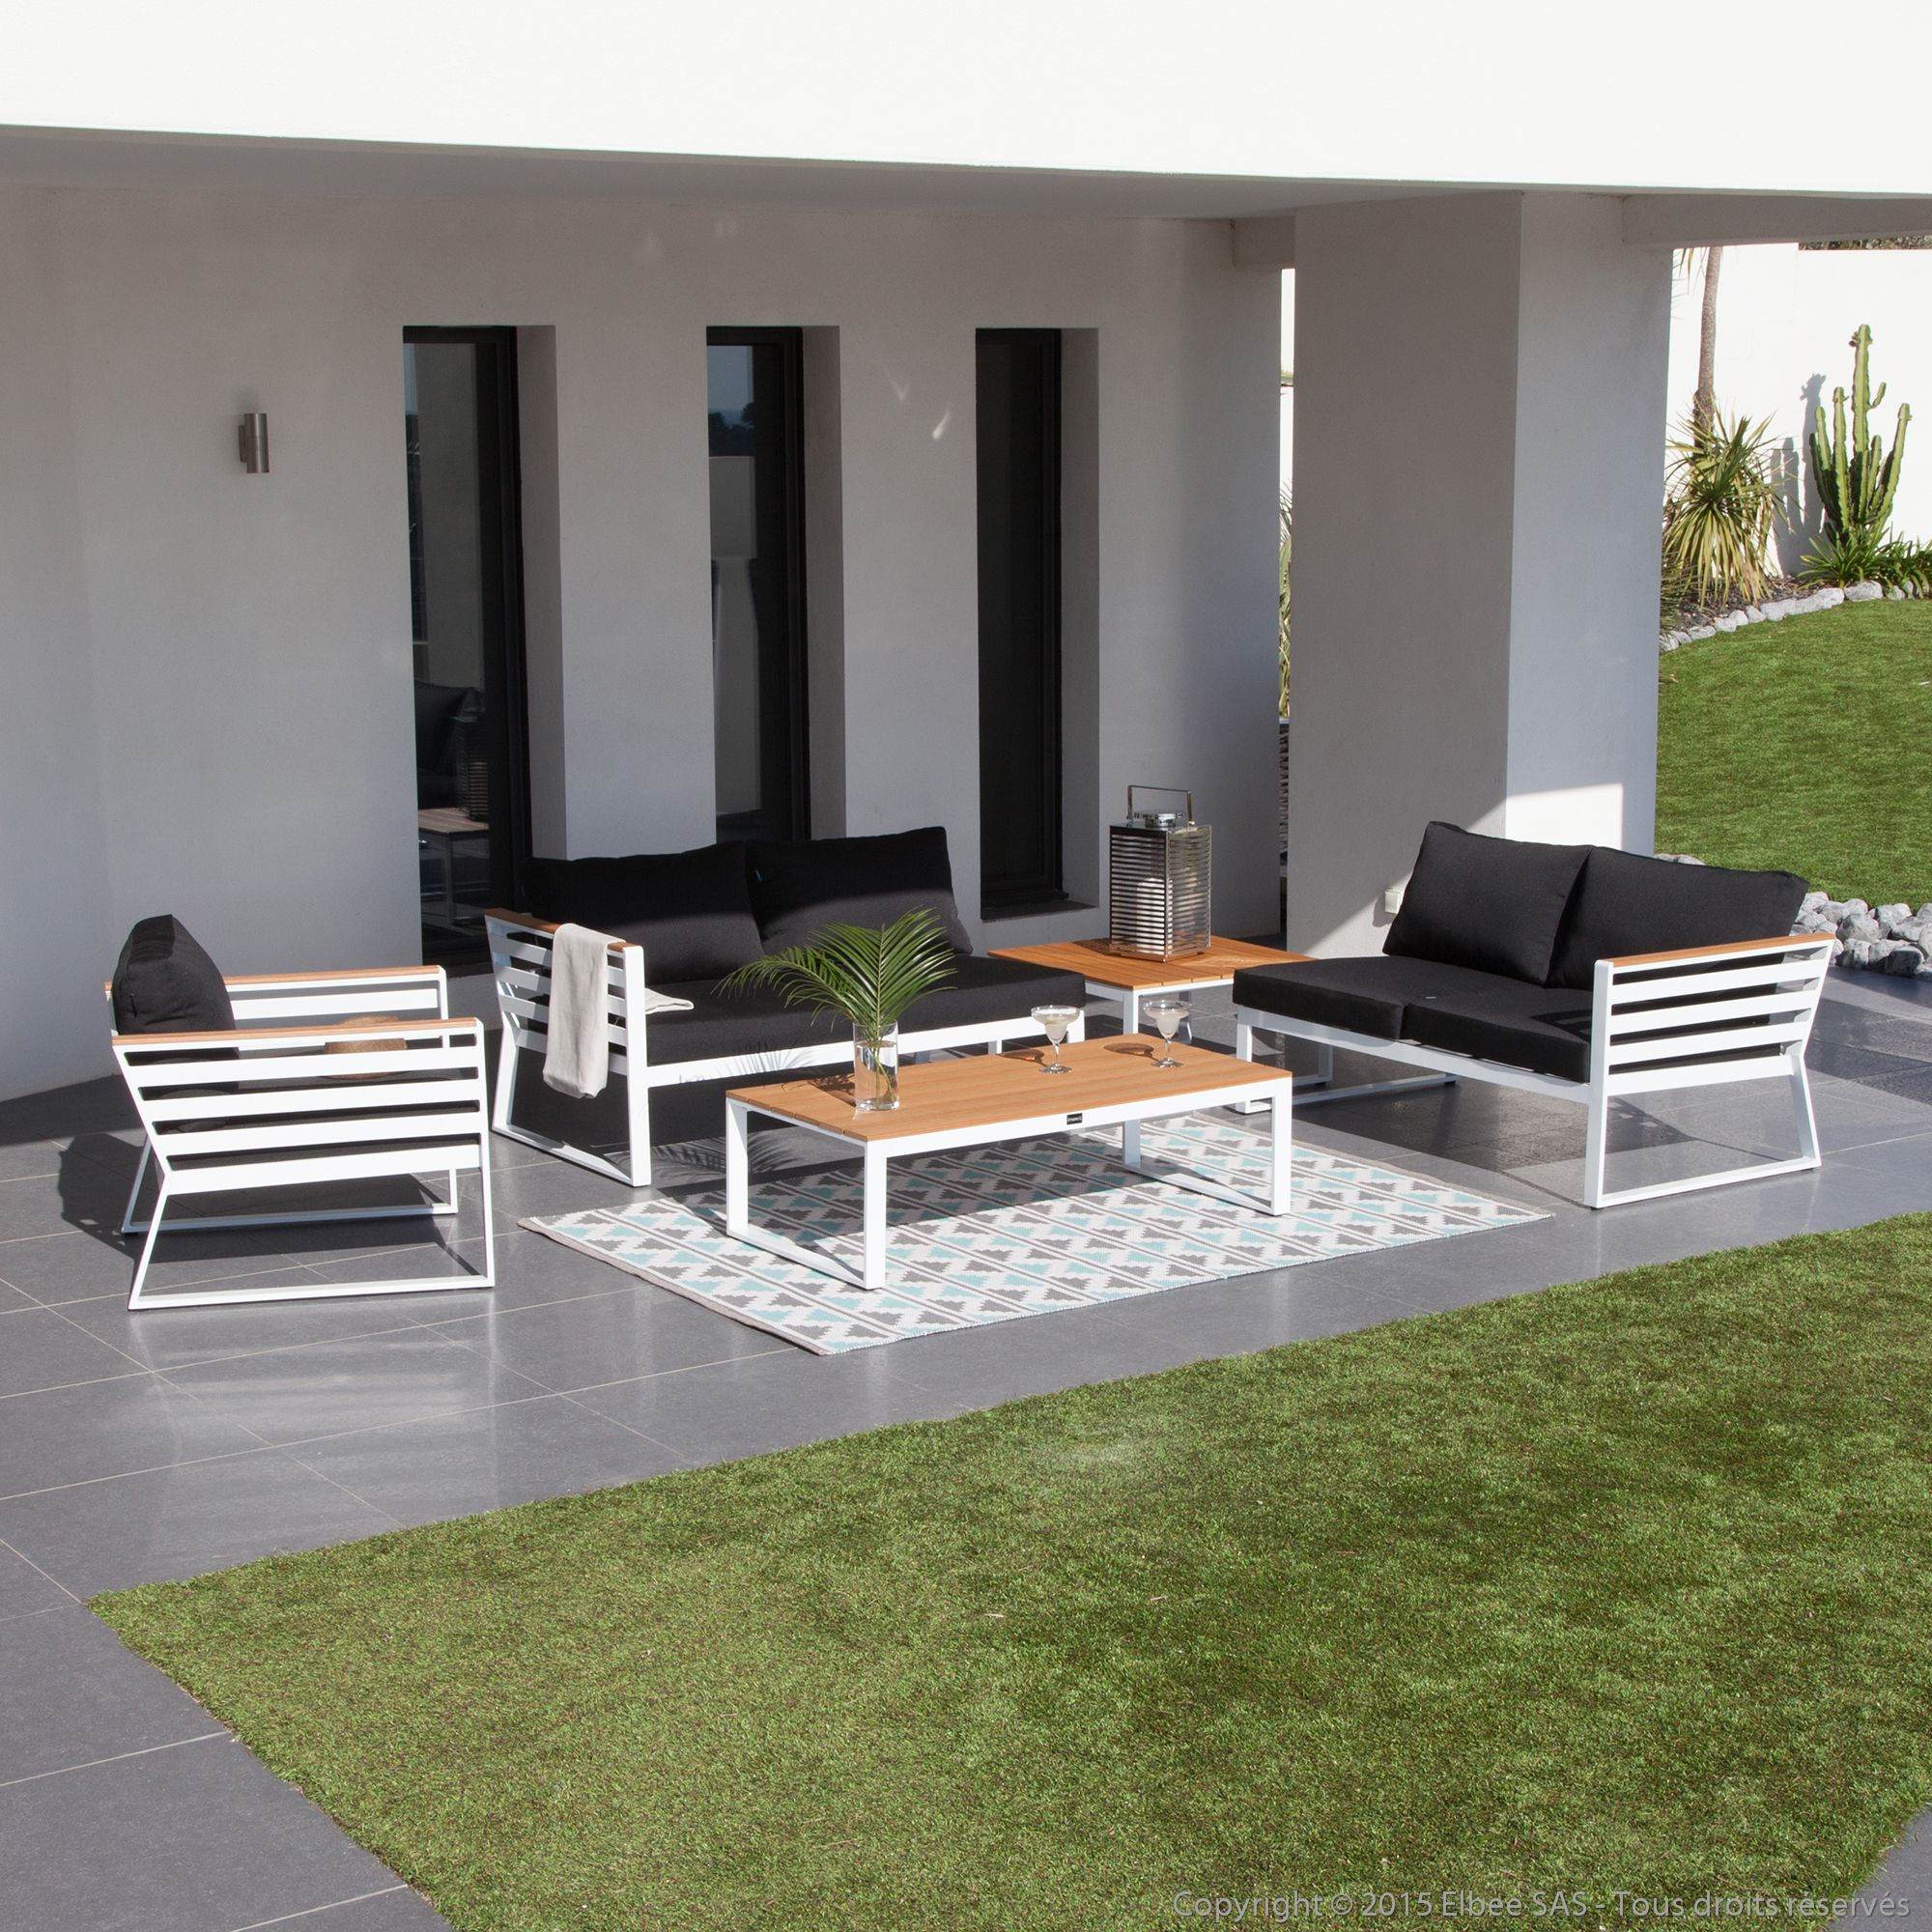 Salon de jardin aluminium 5 places : 2 canapés modulables + 1 ...